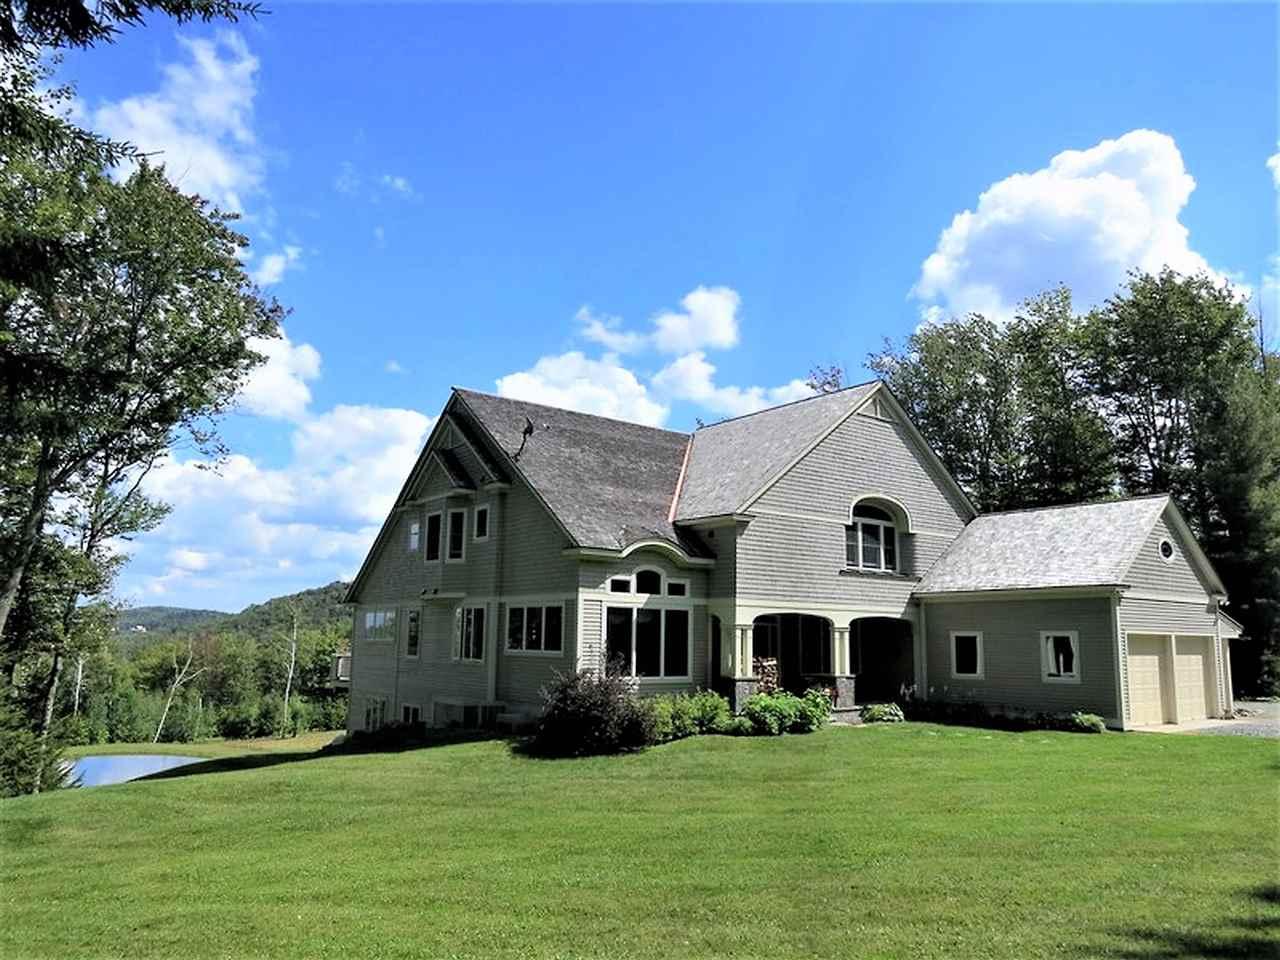 Mount-Snow-Real-Estate-4618541-5